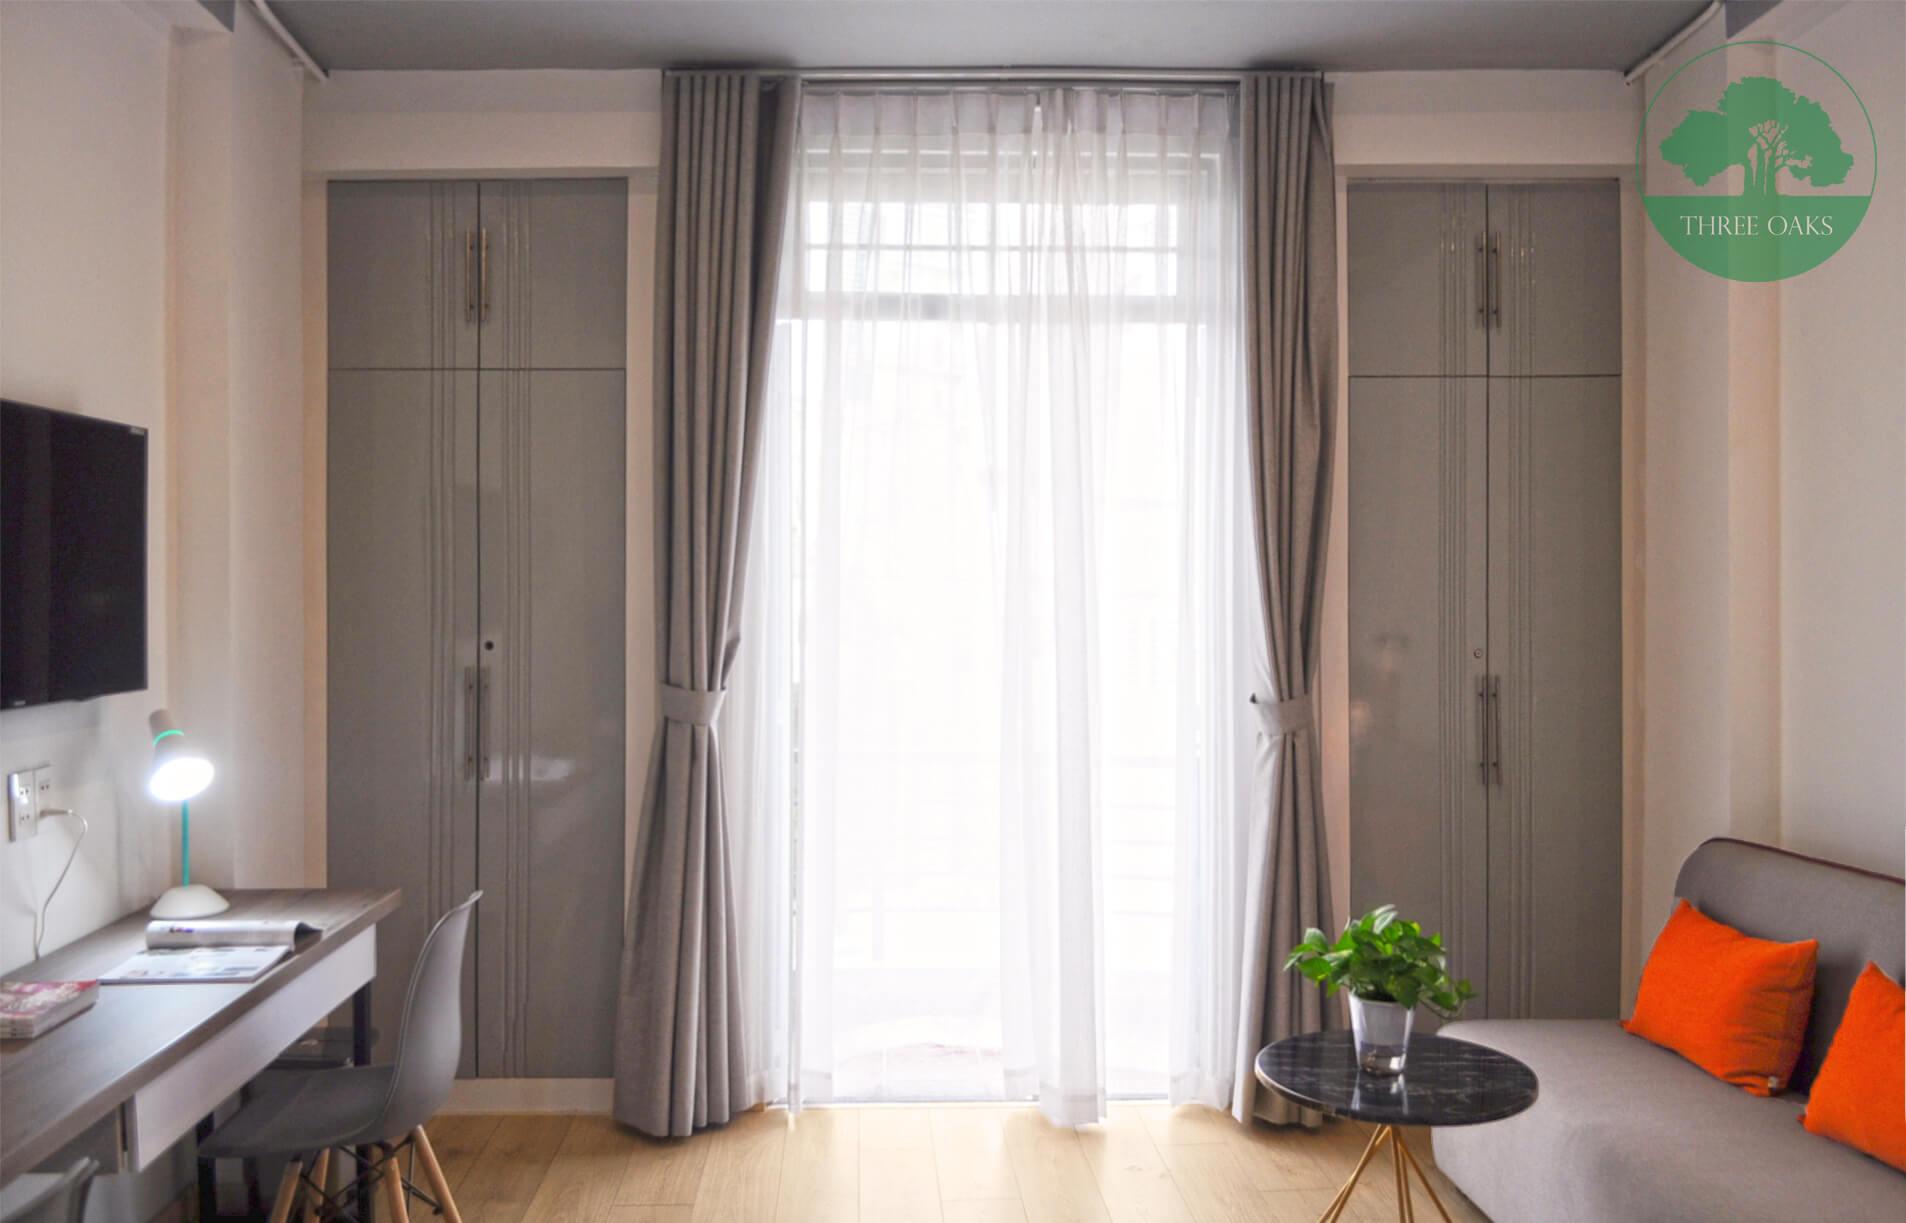 Apartment-for-rent-in-Ho-Chi-Minh-city-Saigon-threeoaks-6-Balcony-9